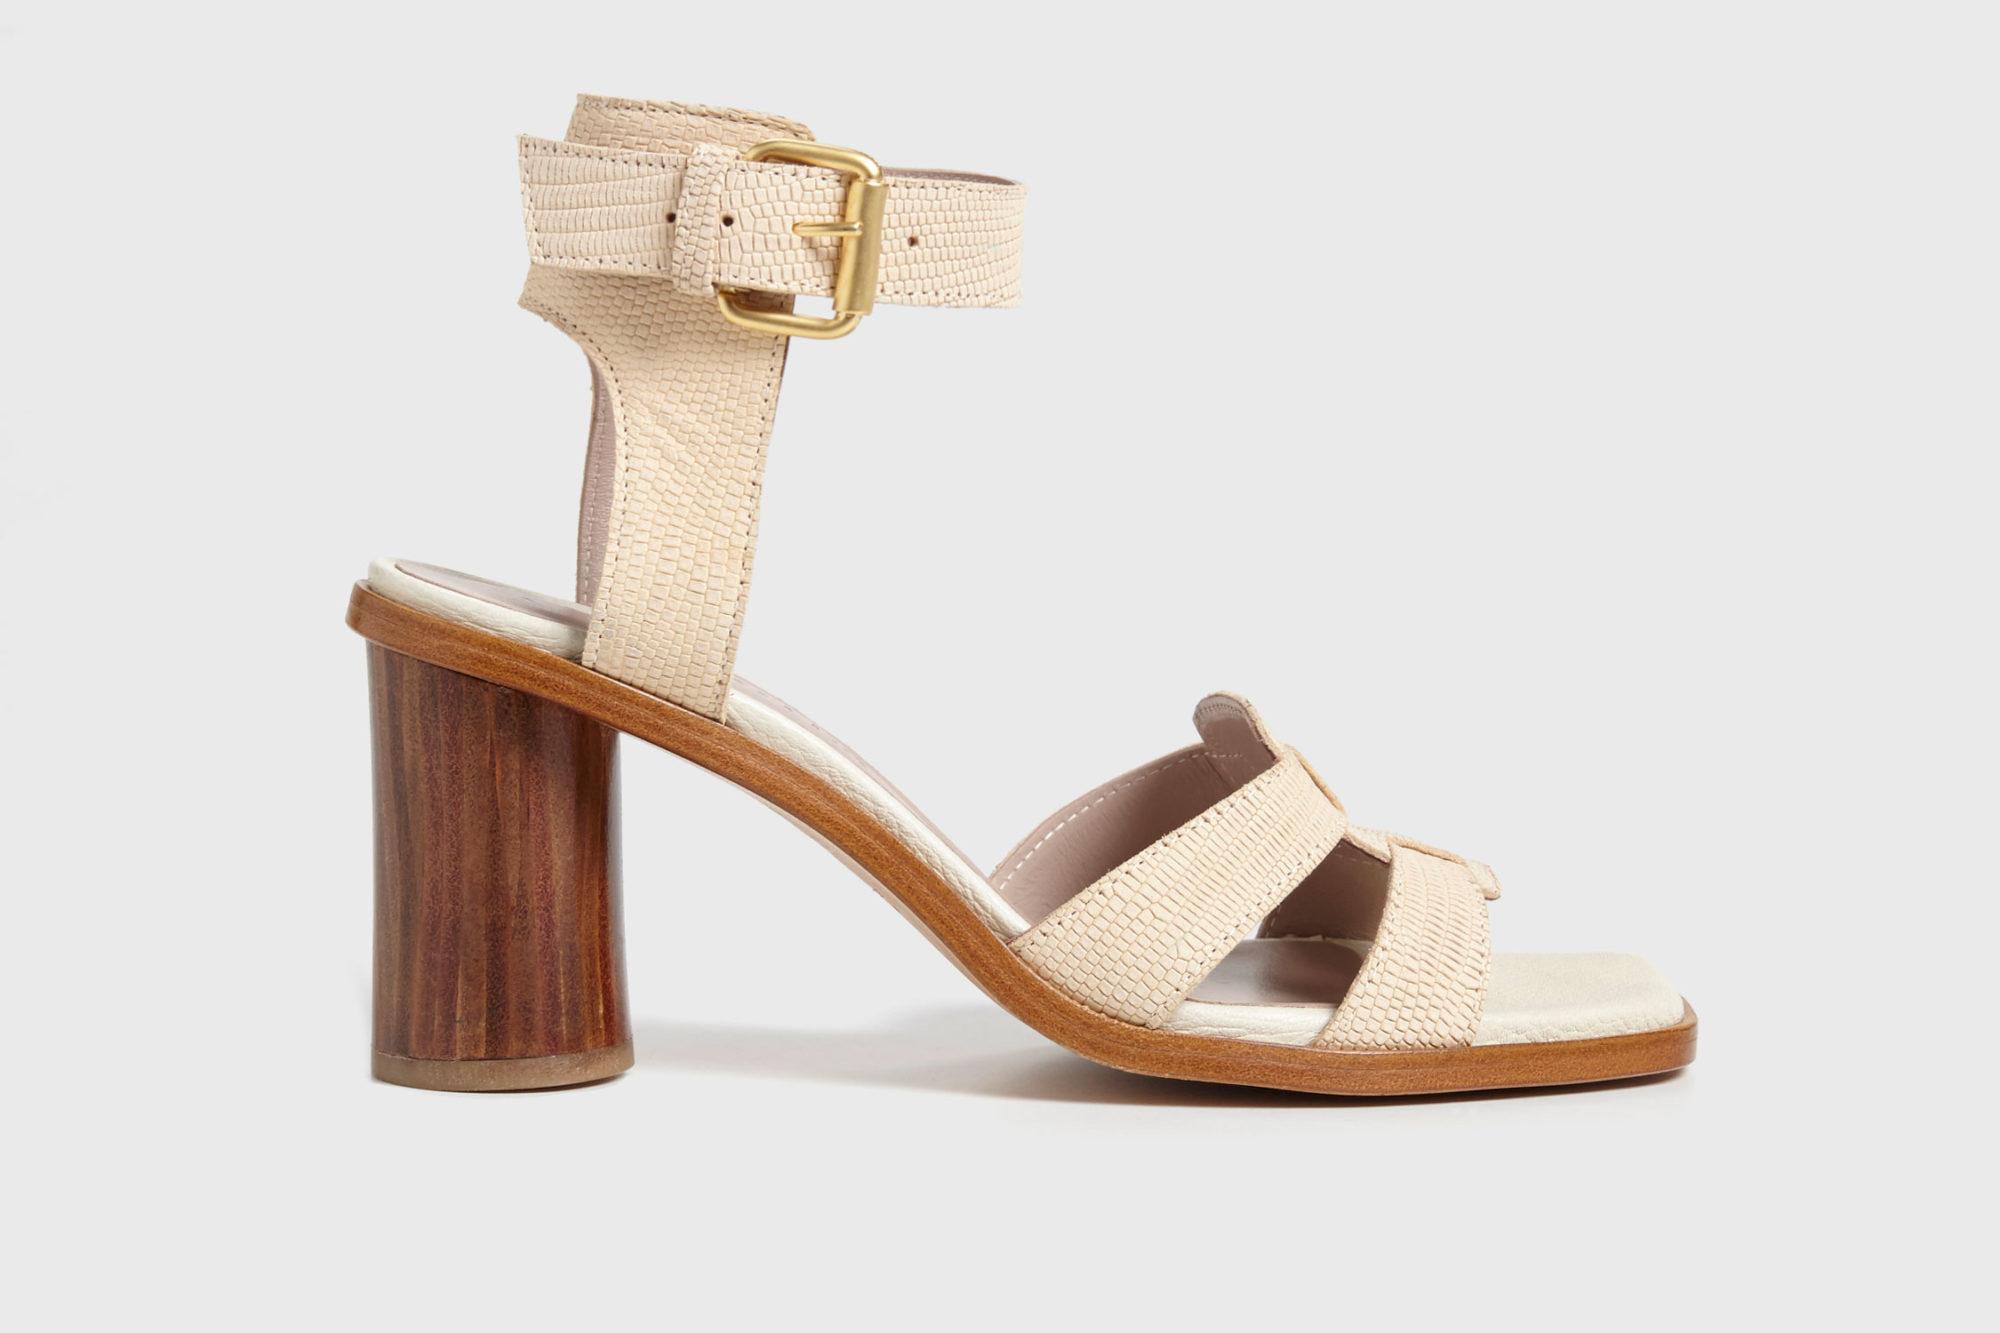 Dorotea sandalia de tacón alto Lianne nude ss17 perfil